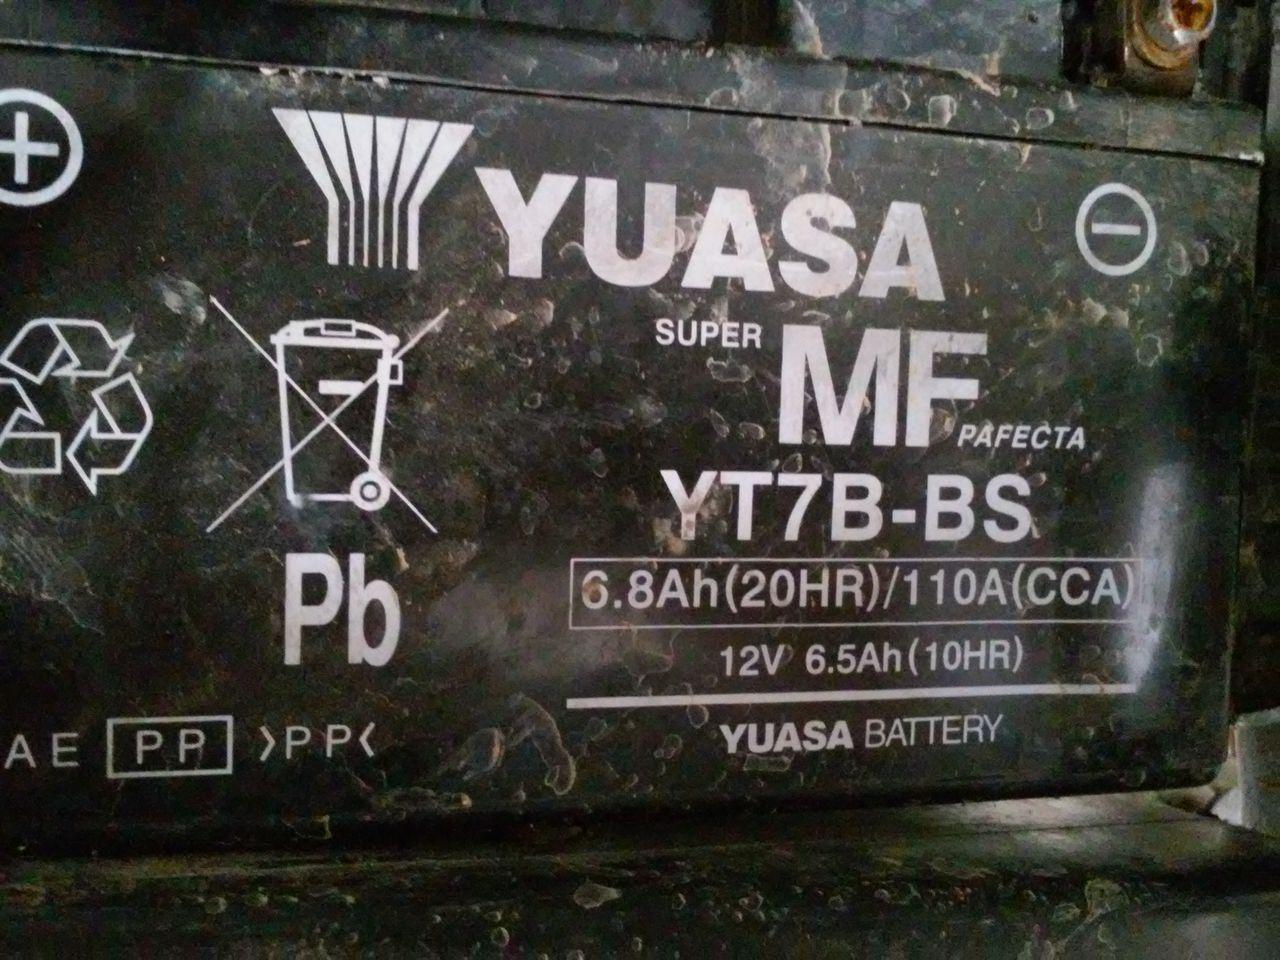 Yamaha TTR 250  96 - Página 3 20160206_084105_1